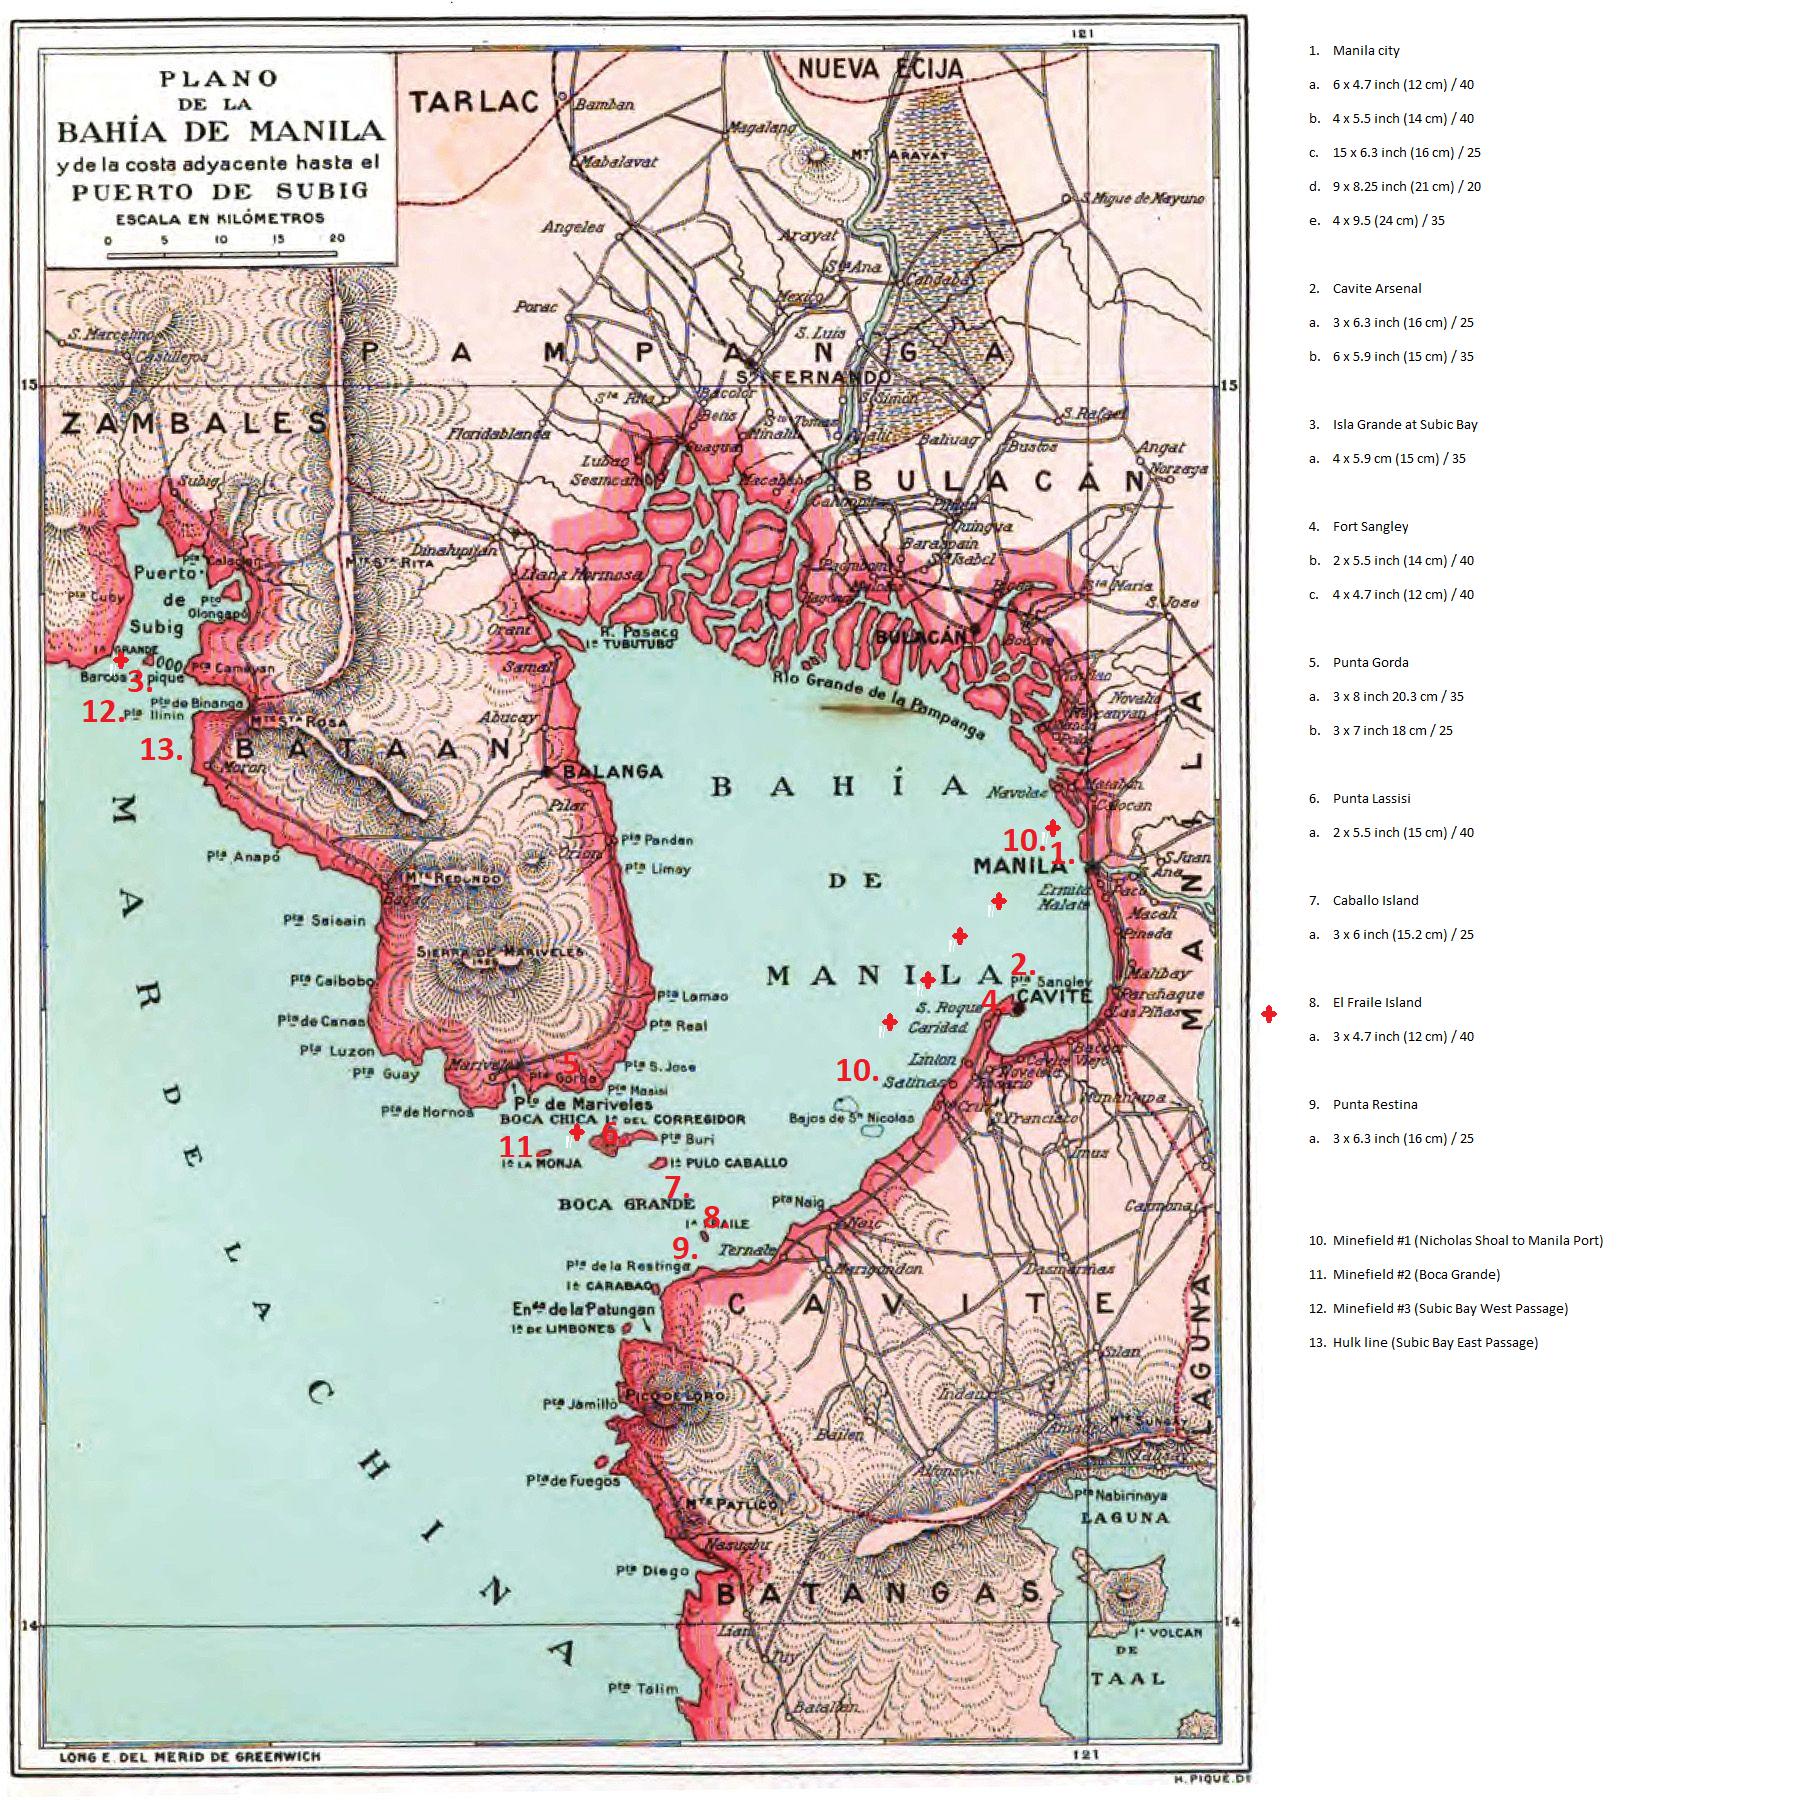 Manila-Bay-defenses-1808.png